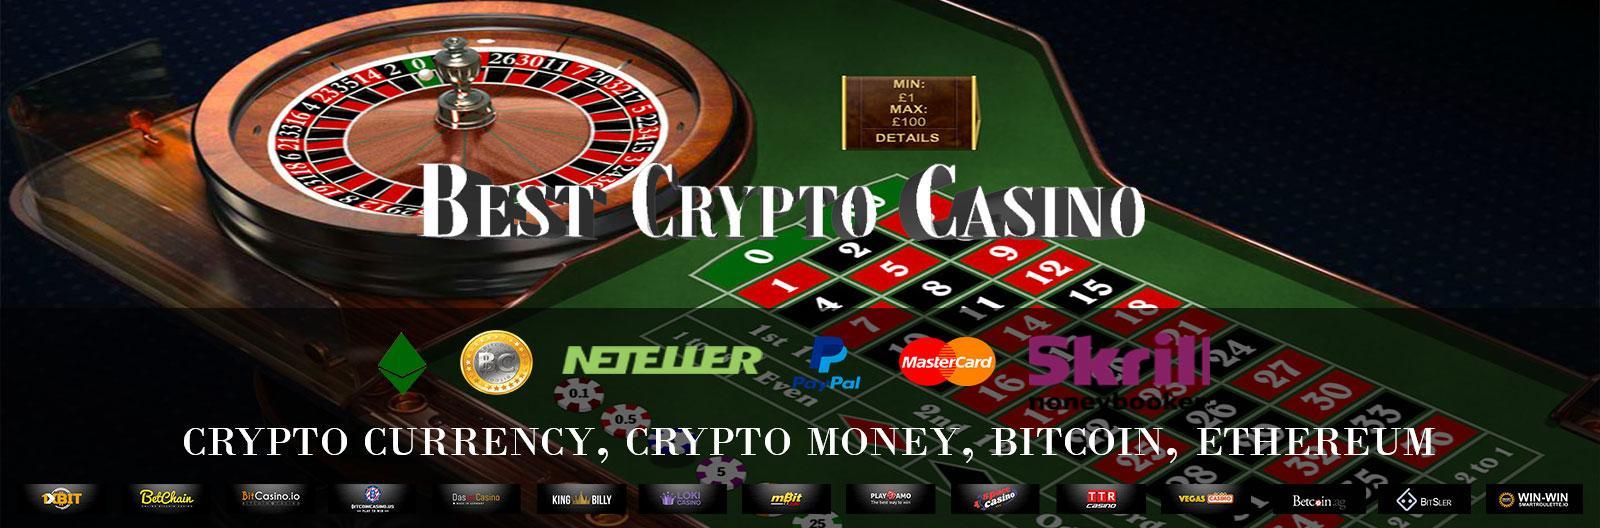 Casino gaming industry market share